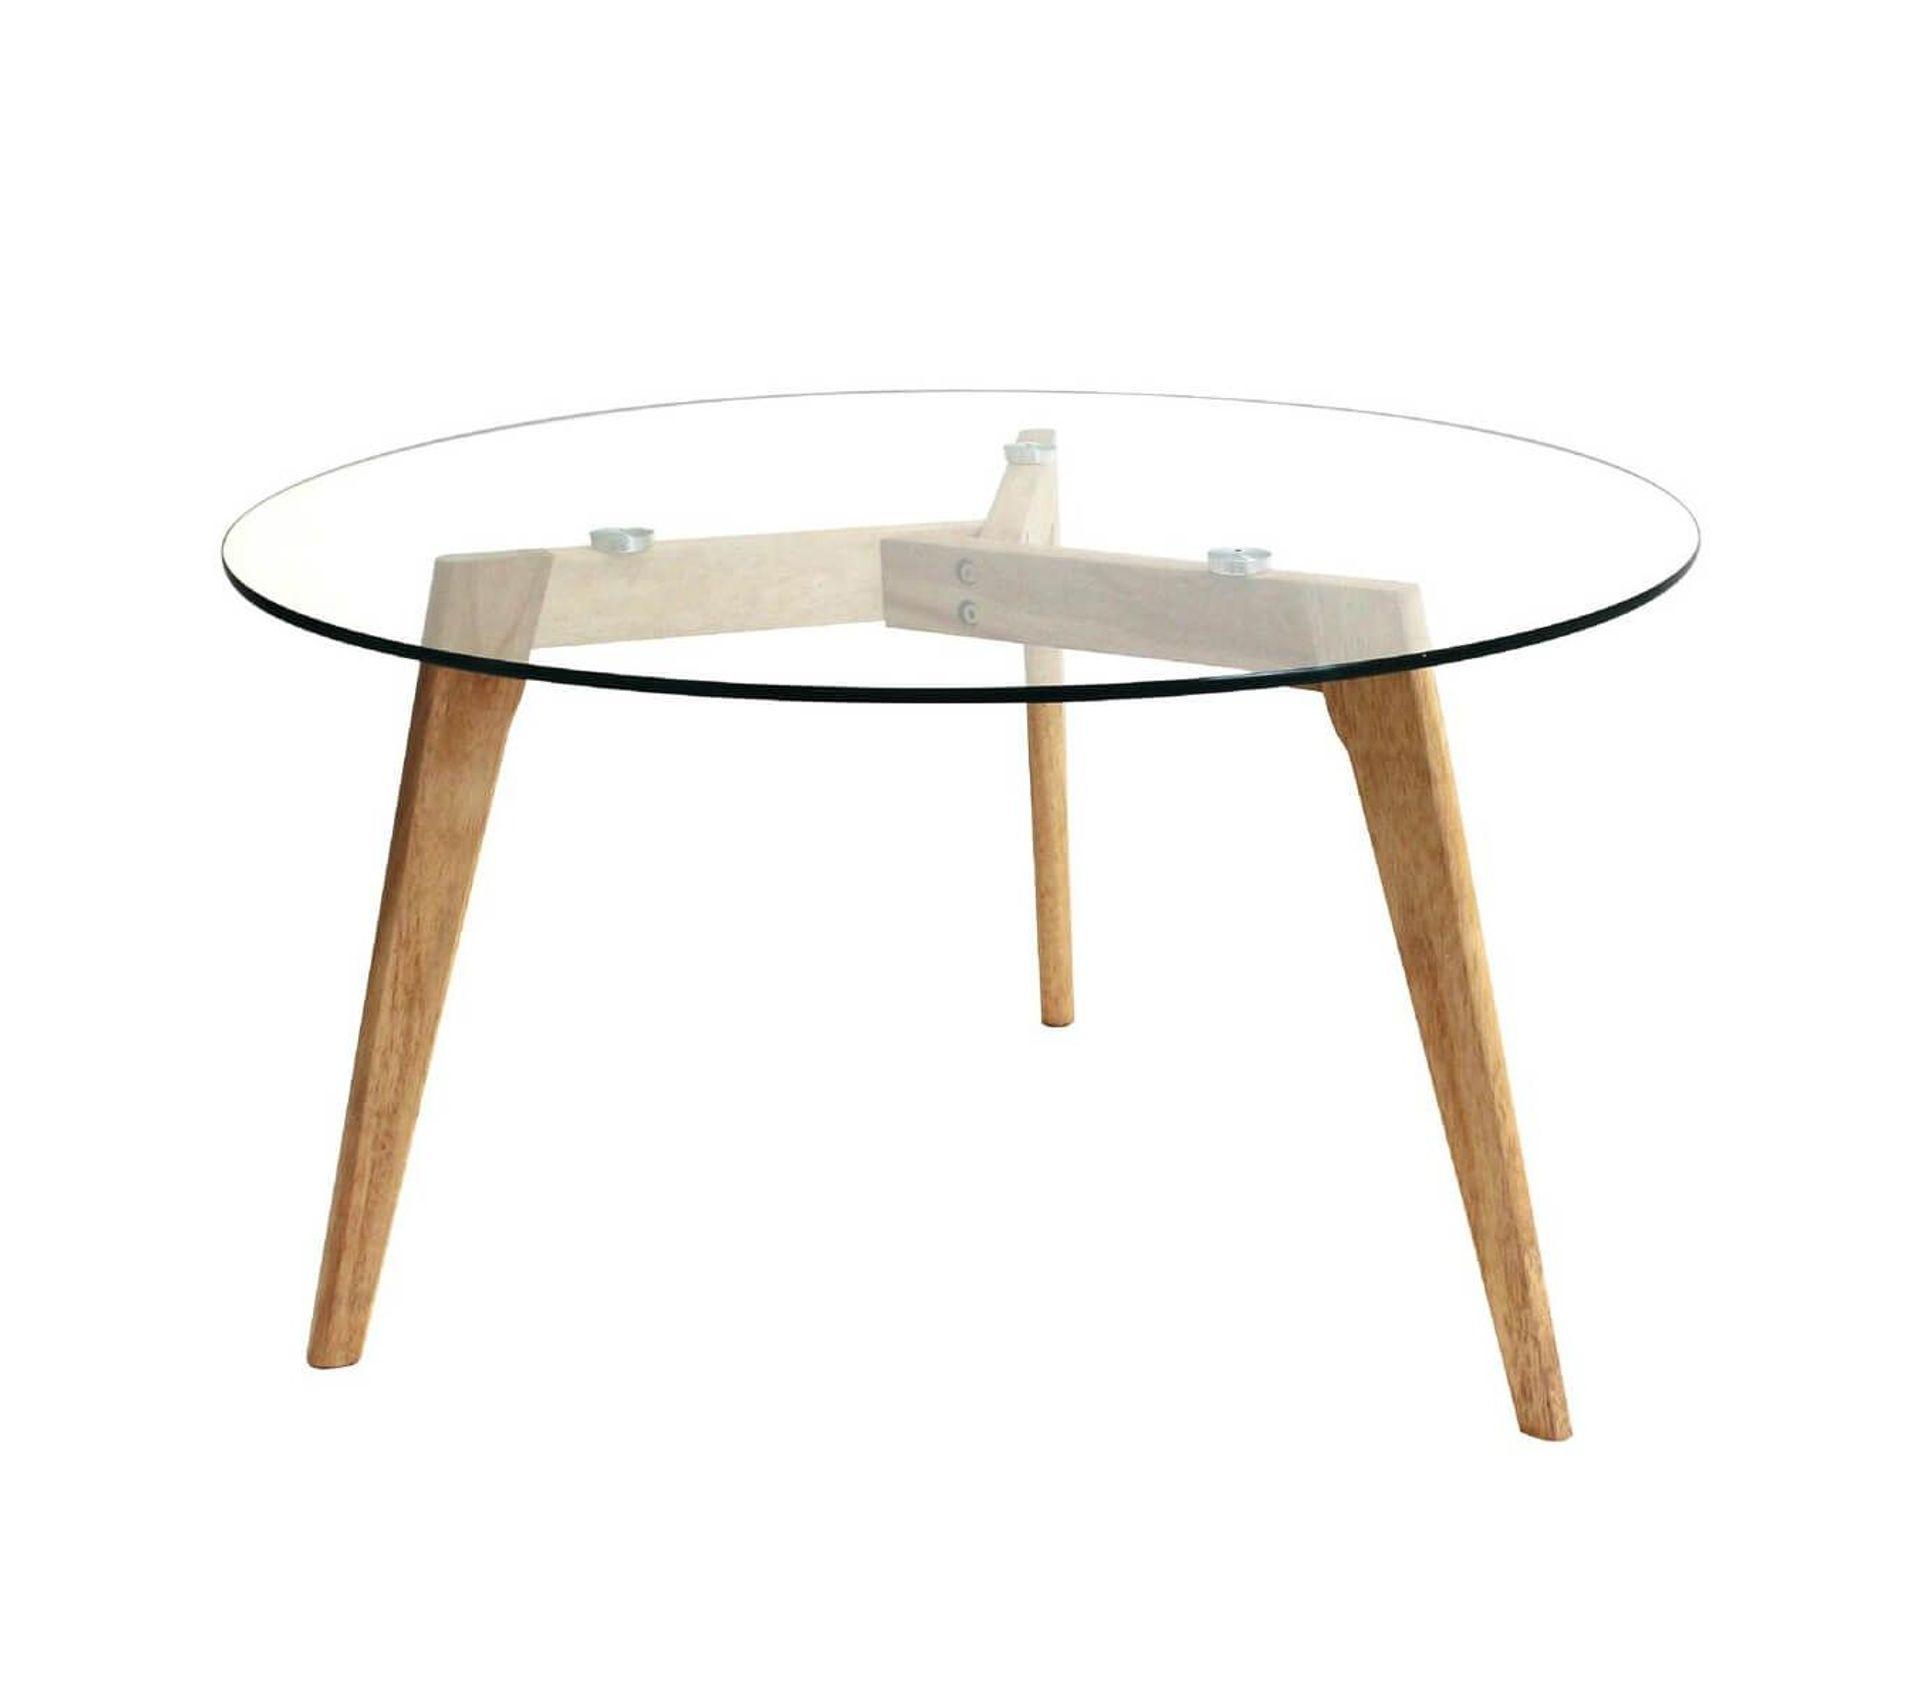 Table Basse Ronde Plateau Verre Verane Table Basse But